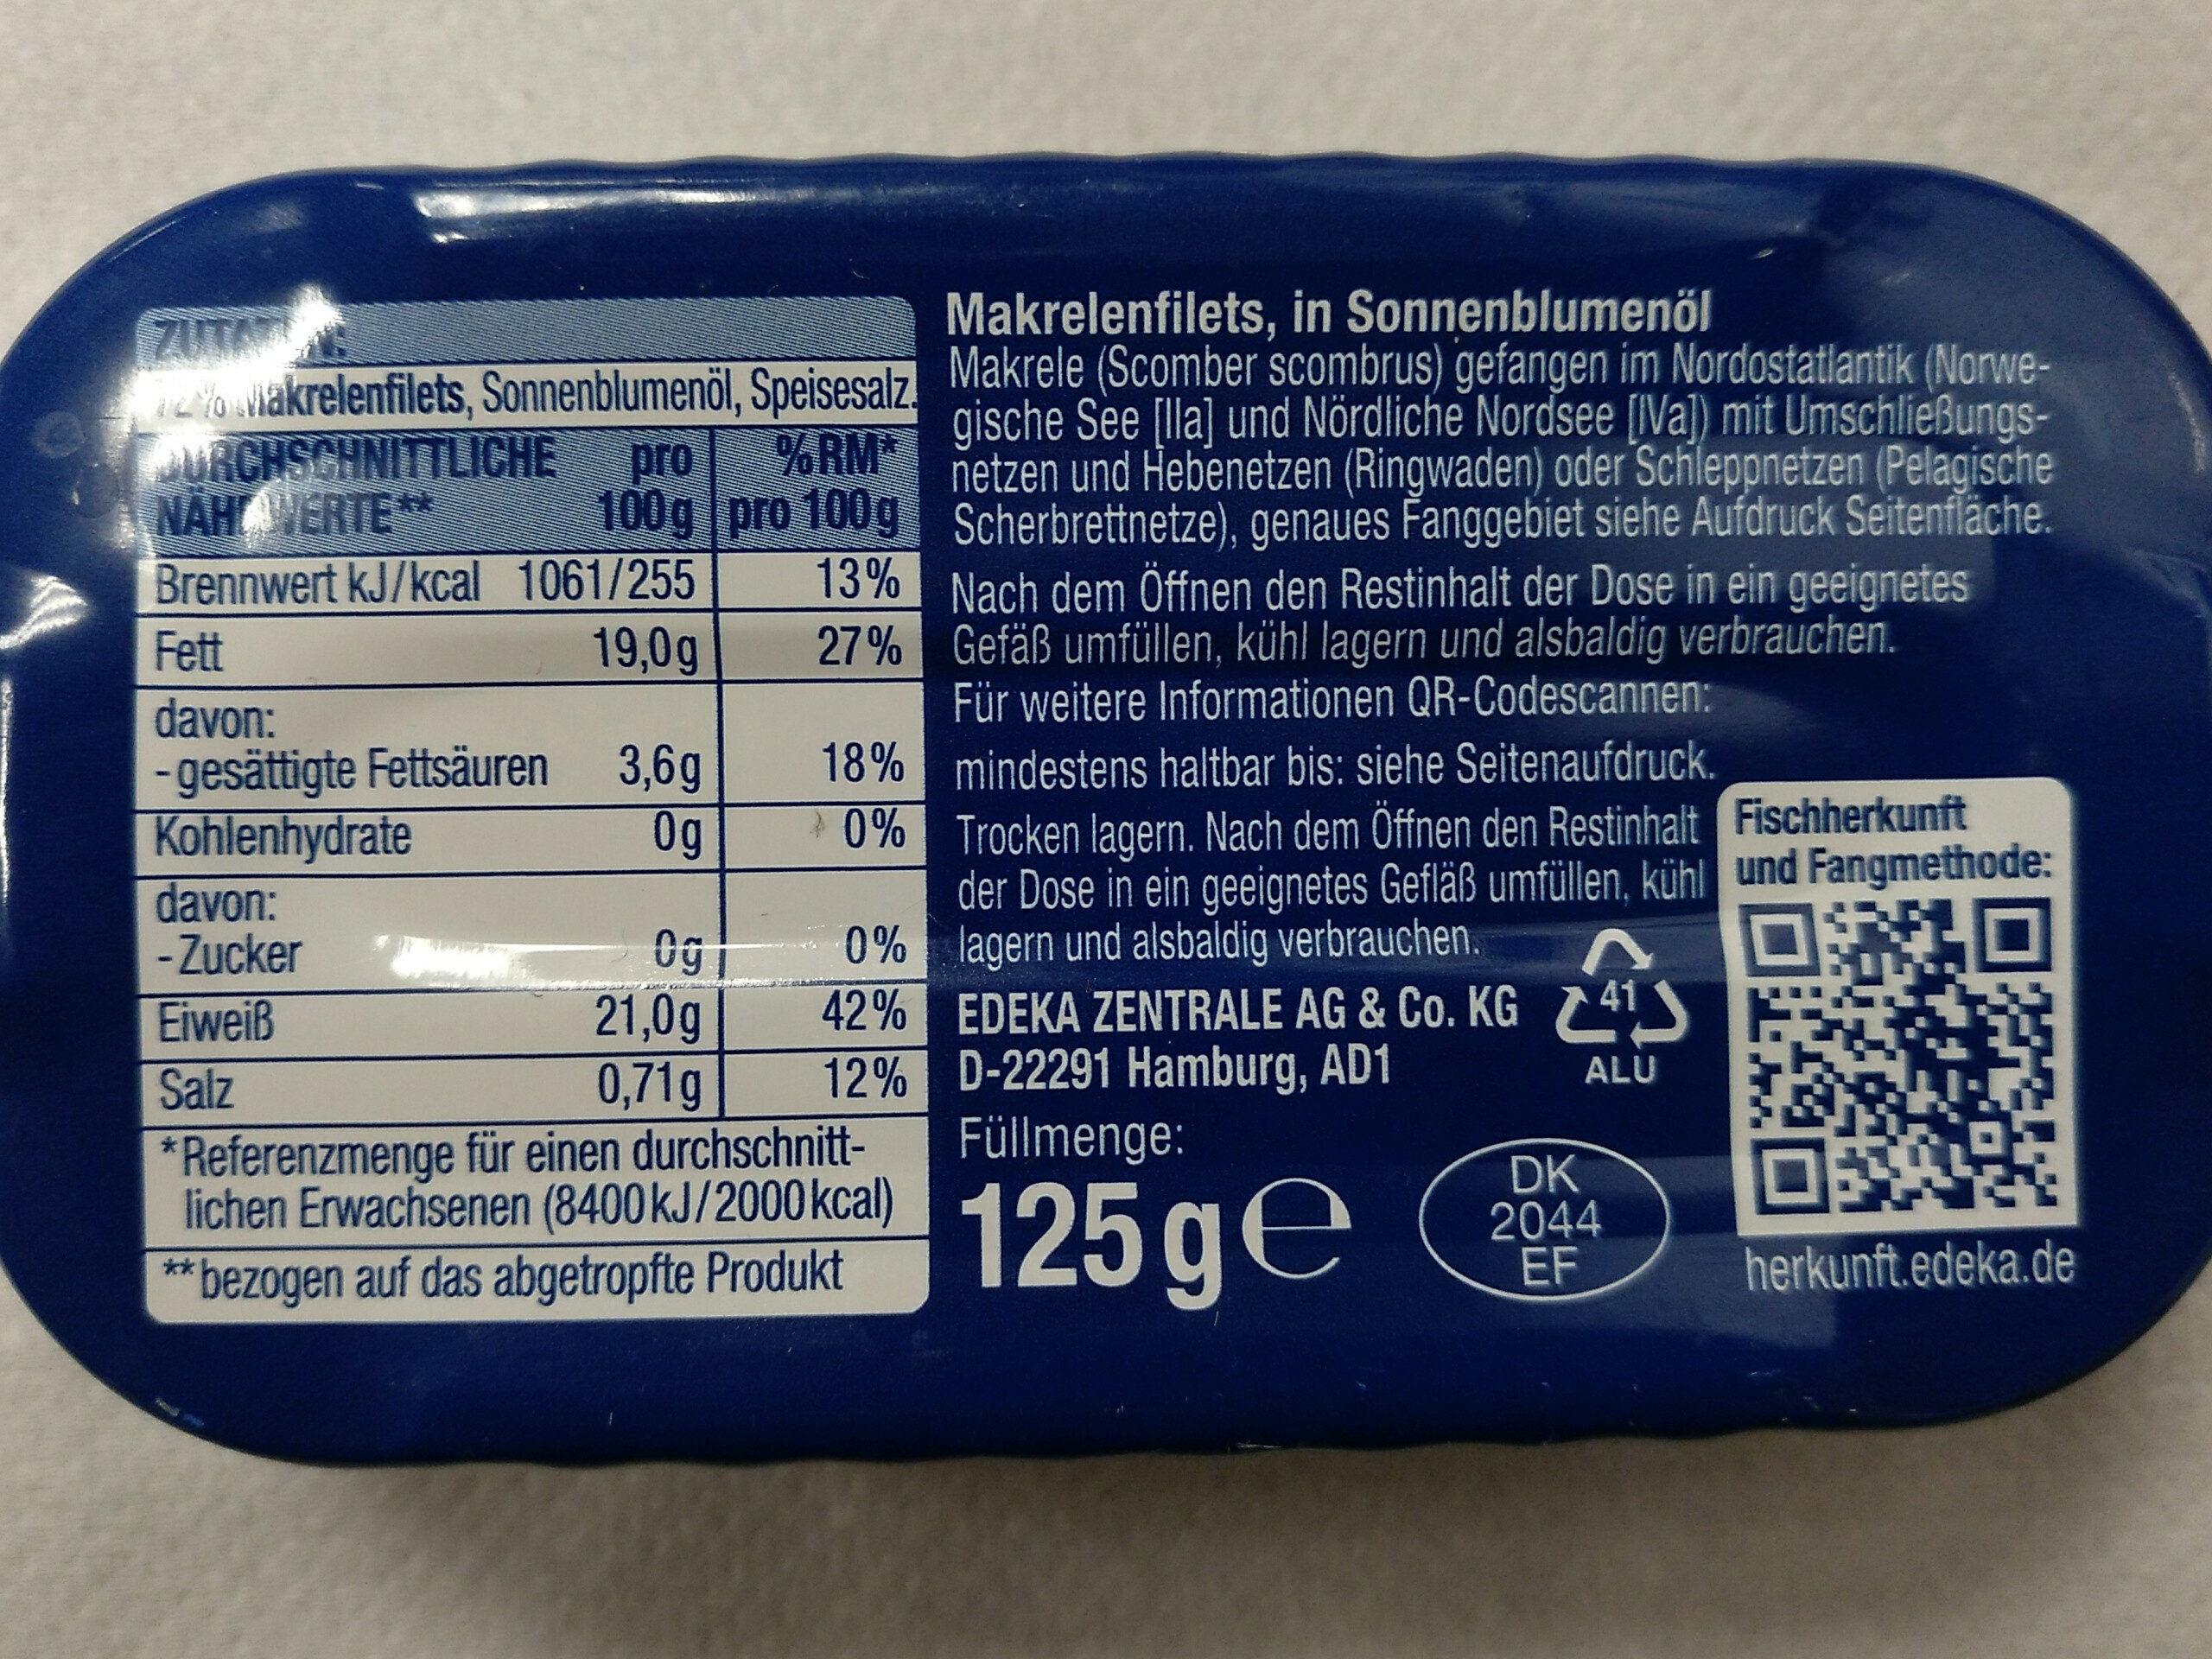 Makrelen Filets - Valori nutrizionali - de